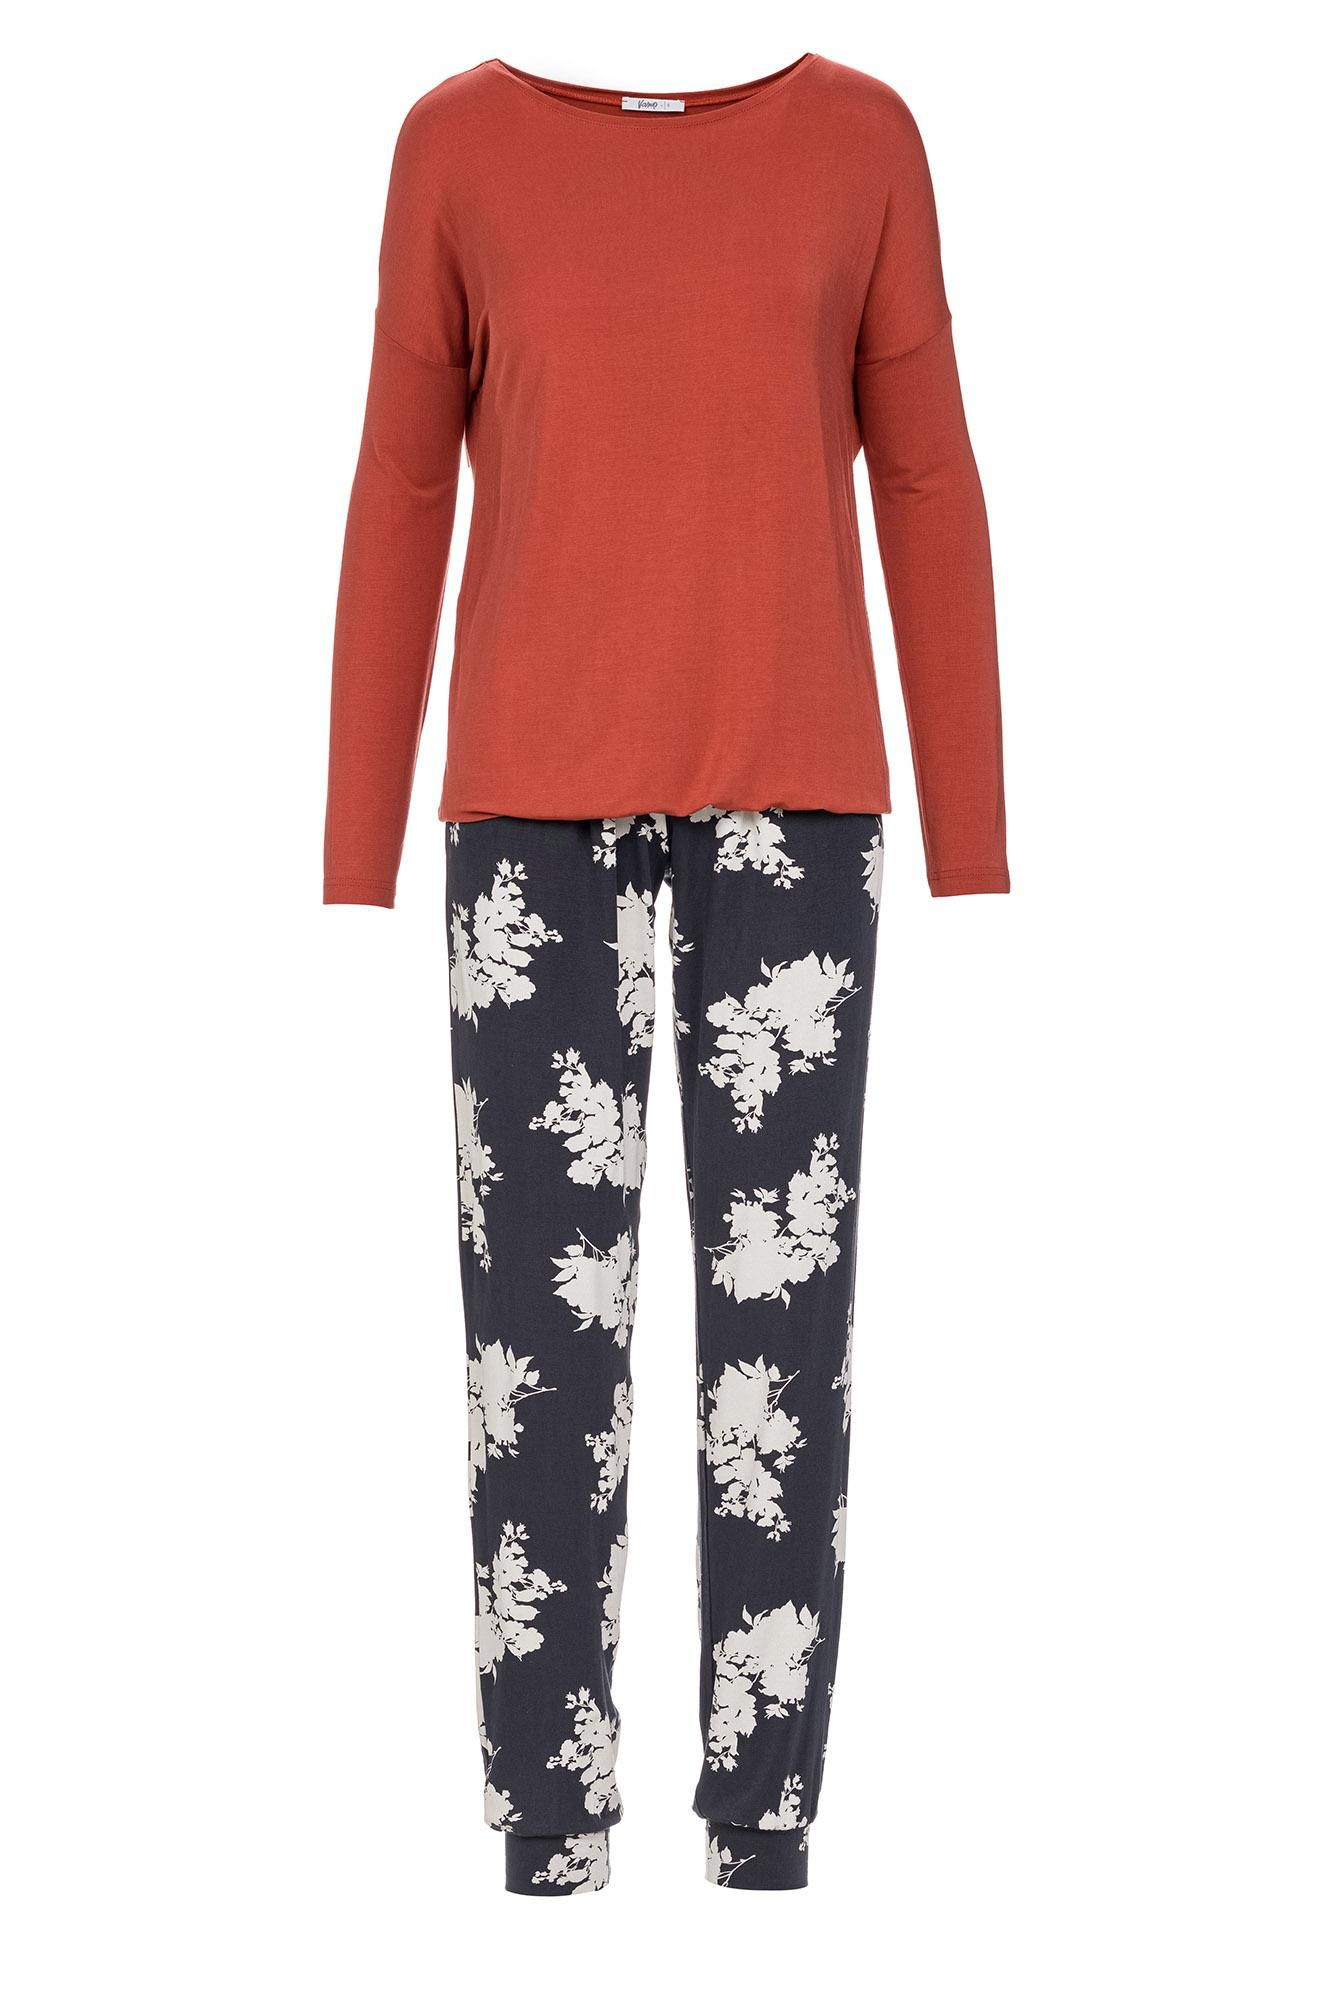 Women's Floral Pyjamas